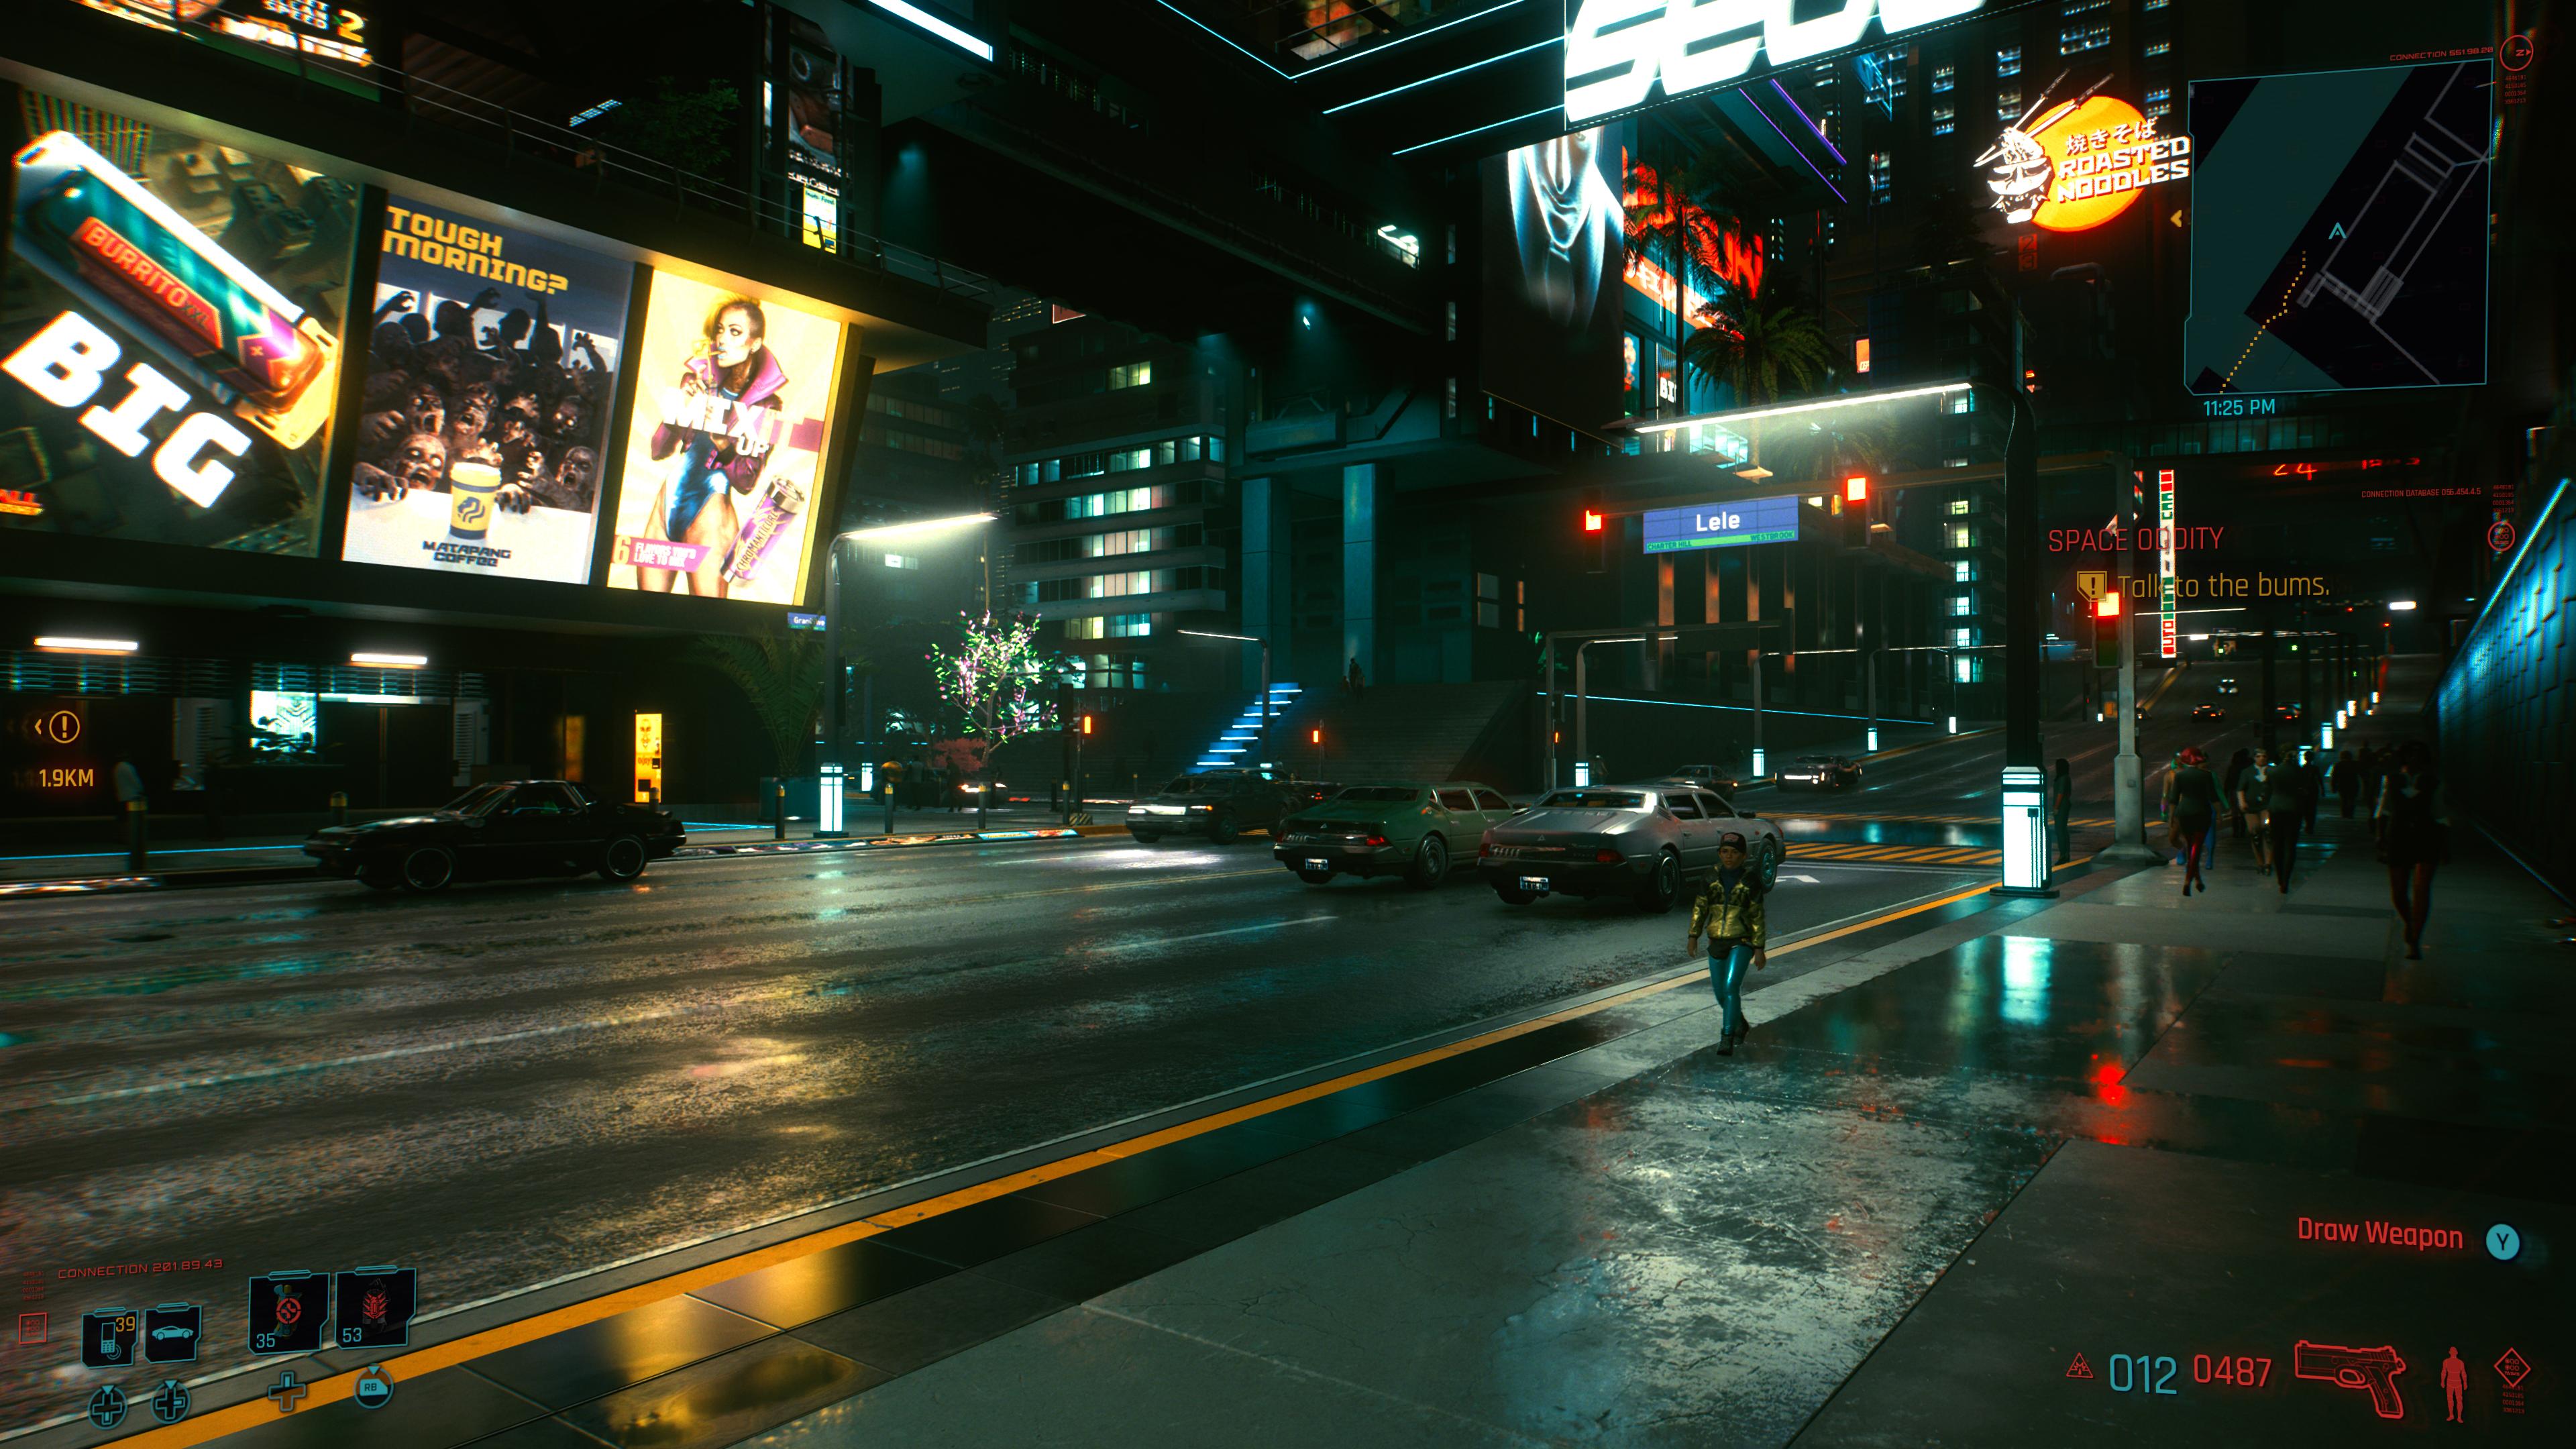 Cyberpunk 2077 (C) 2020 by CD Projekt RED RTX On bei Nacht